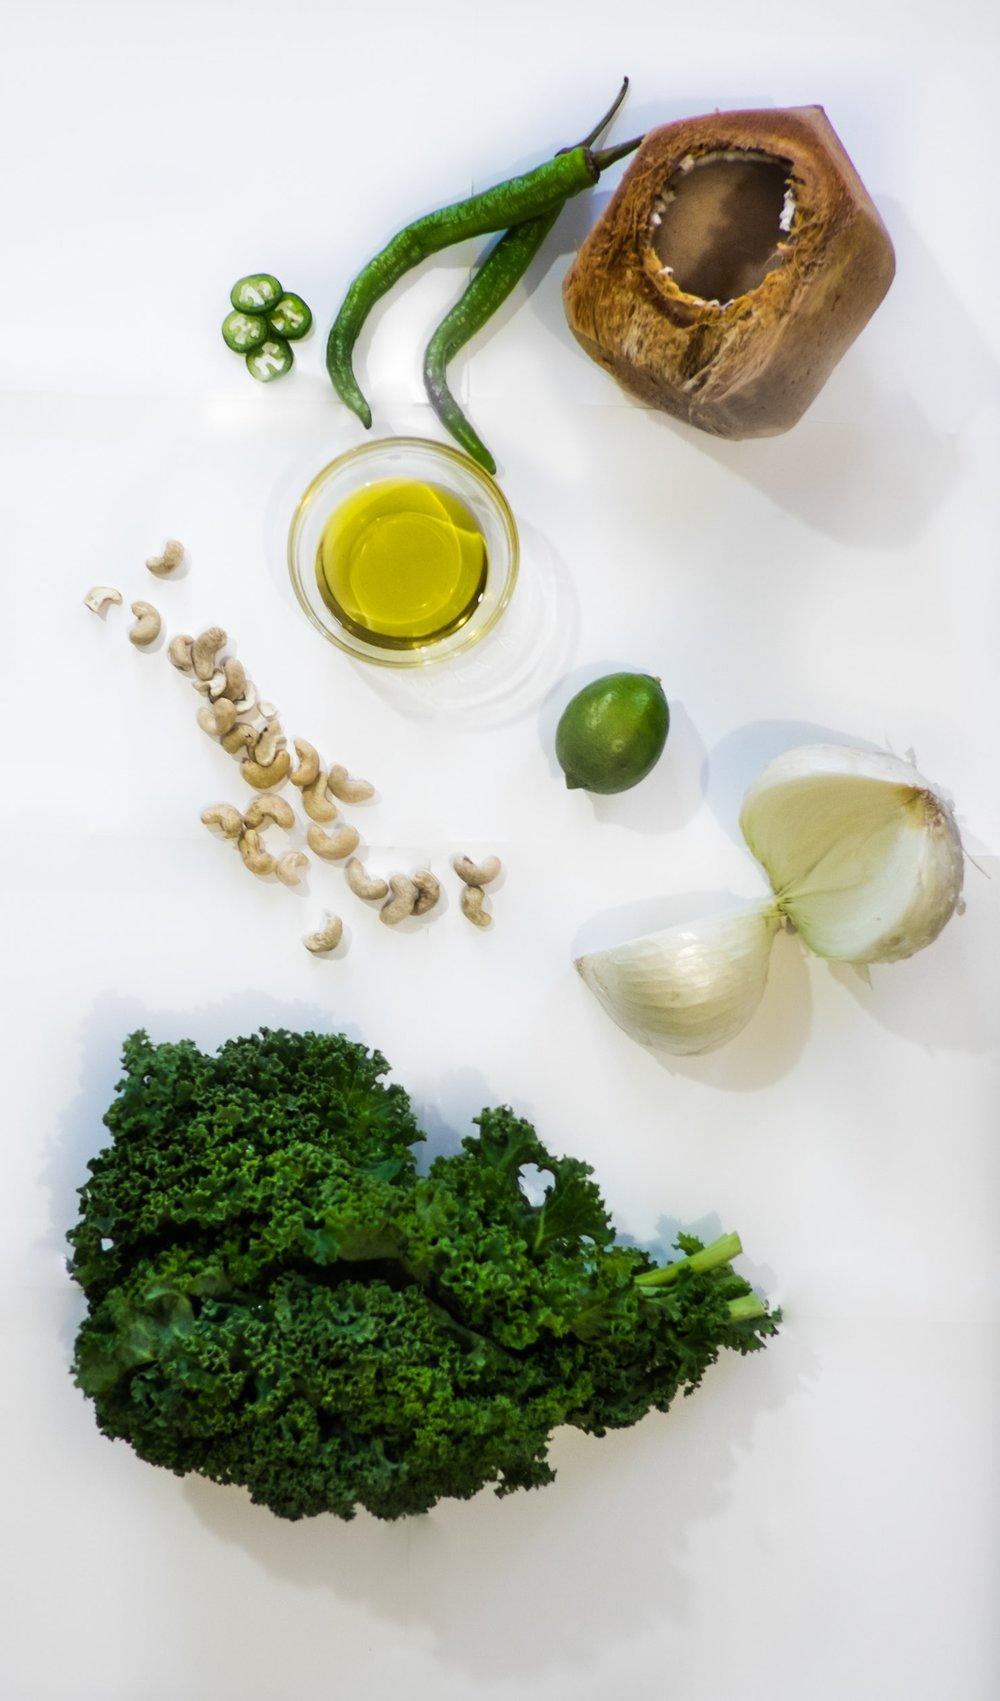 Kottu House salad immigrant report-1.jpg